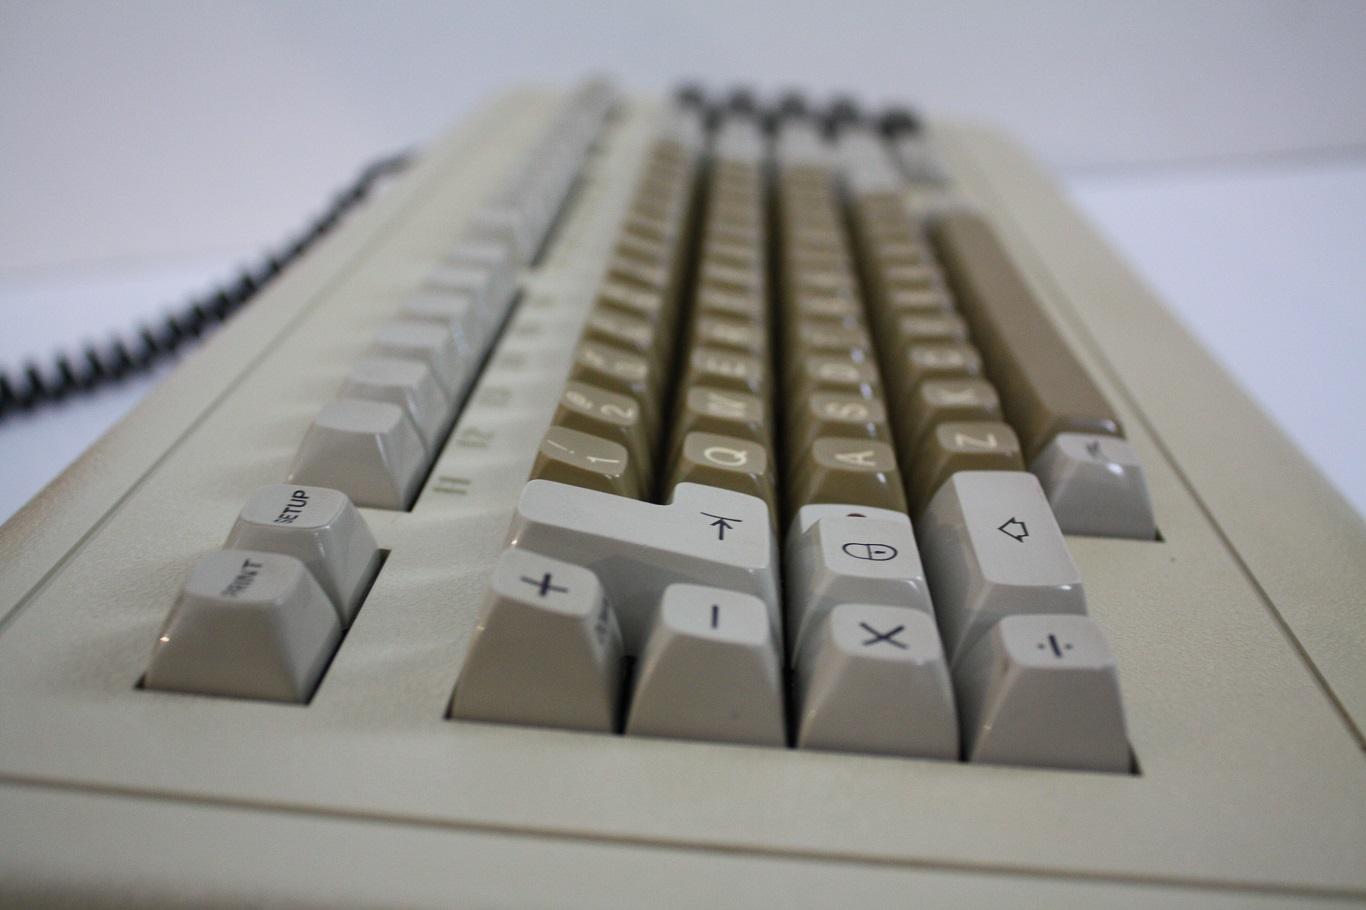 Cherry Terminal Keyboard - Profile 2.jpg